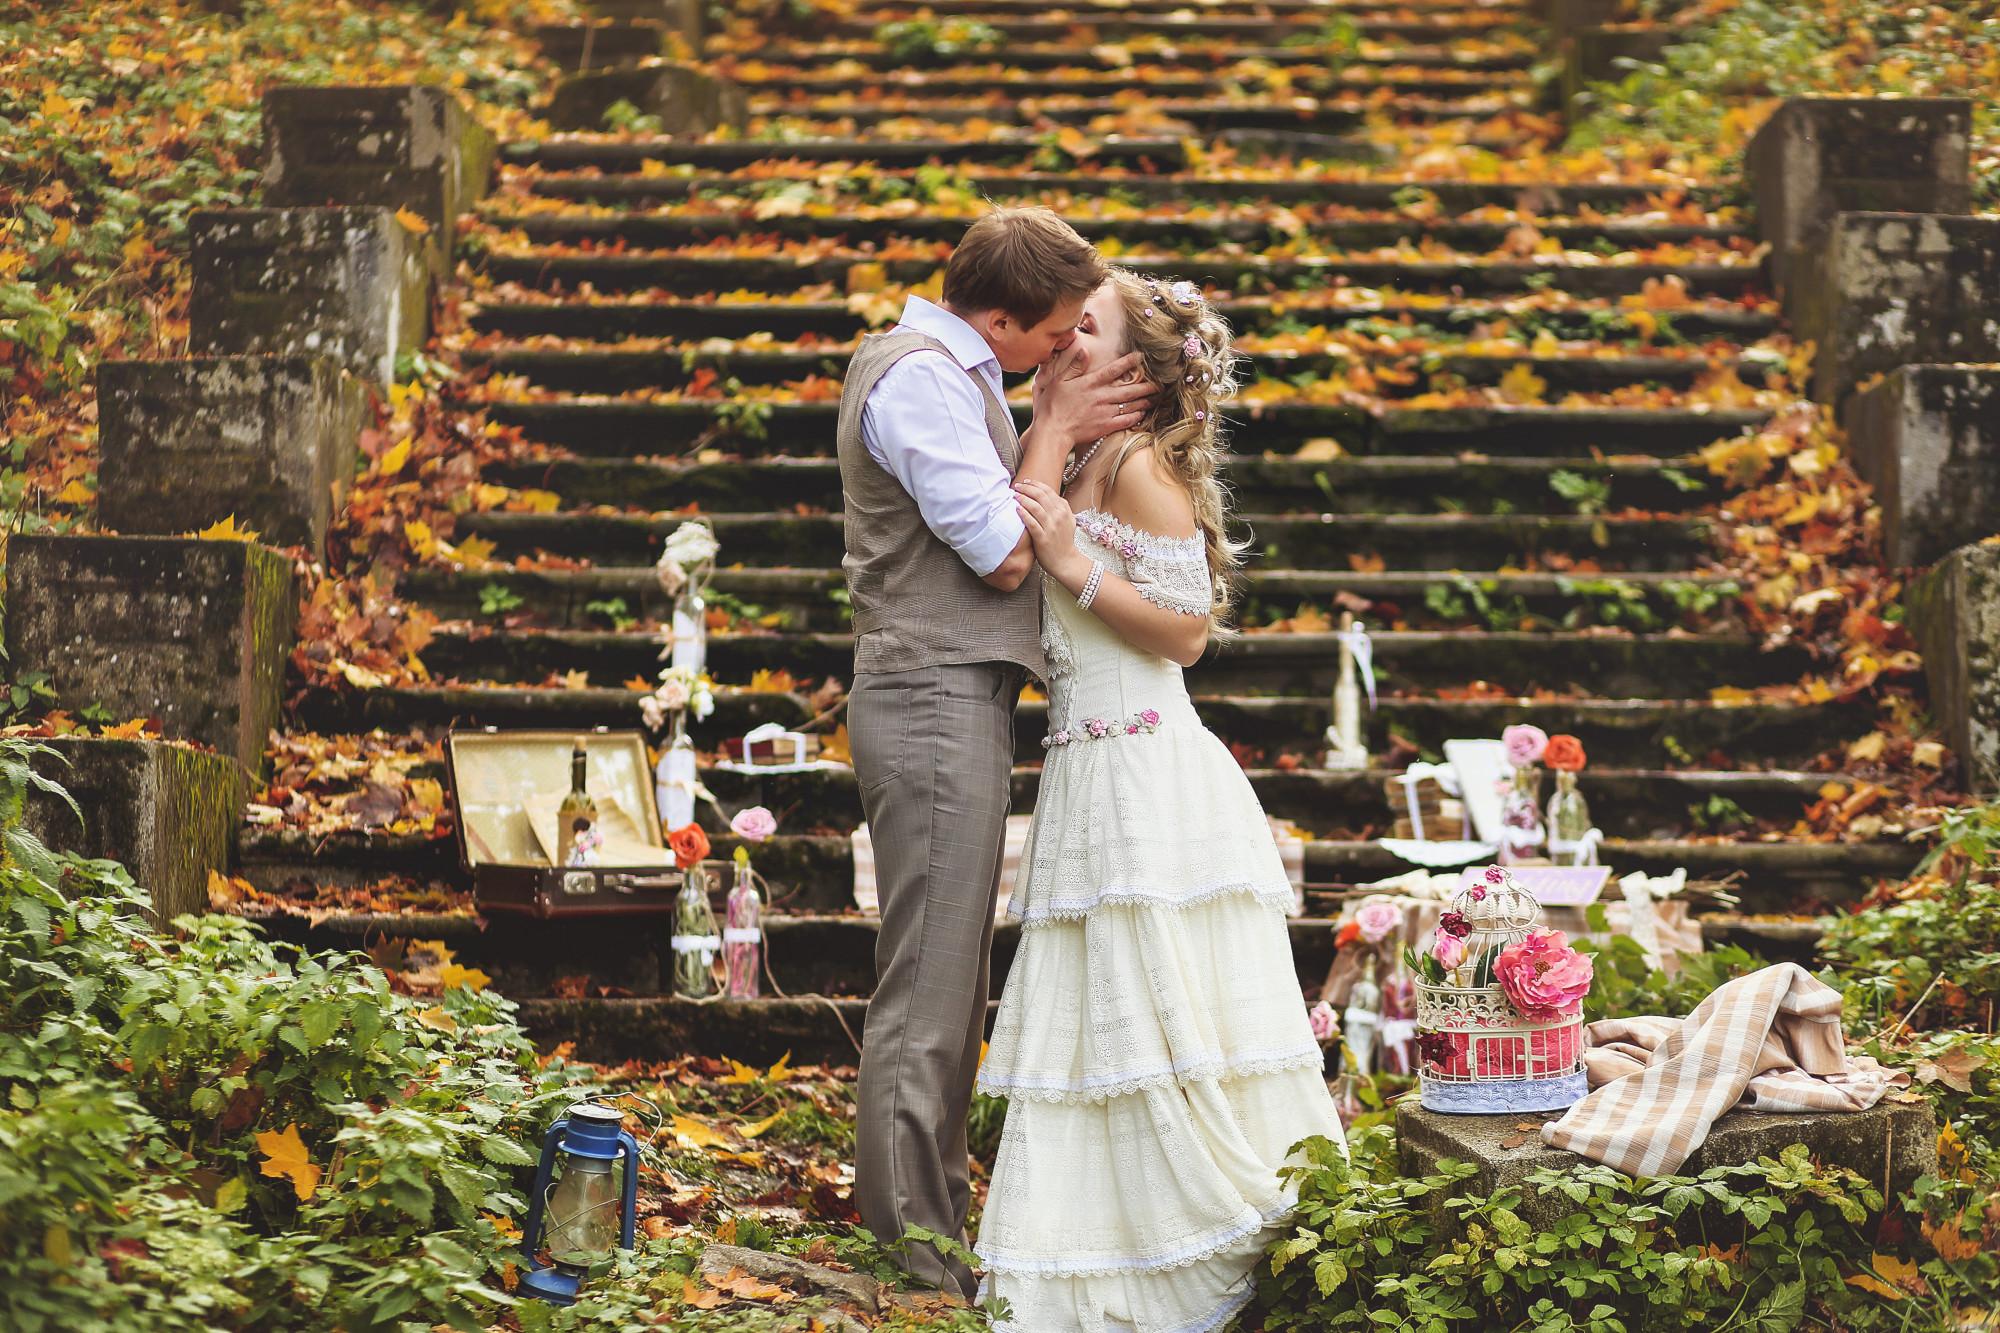 Vintage-Themed Wedding